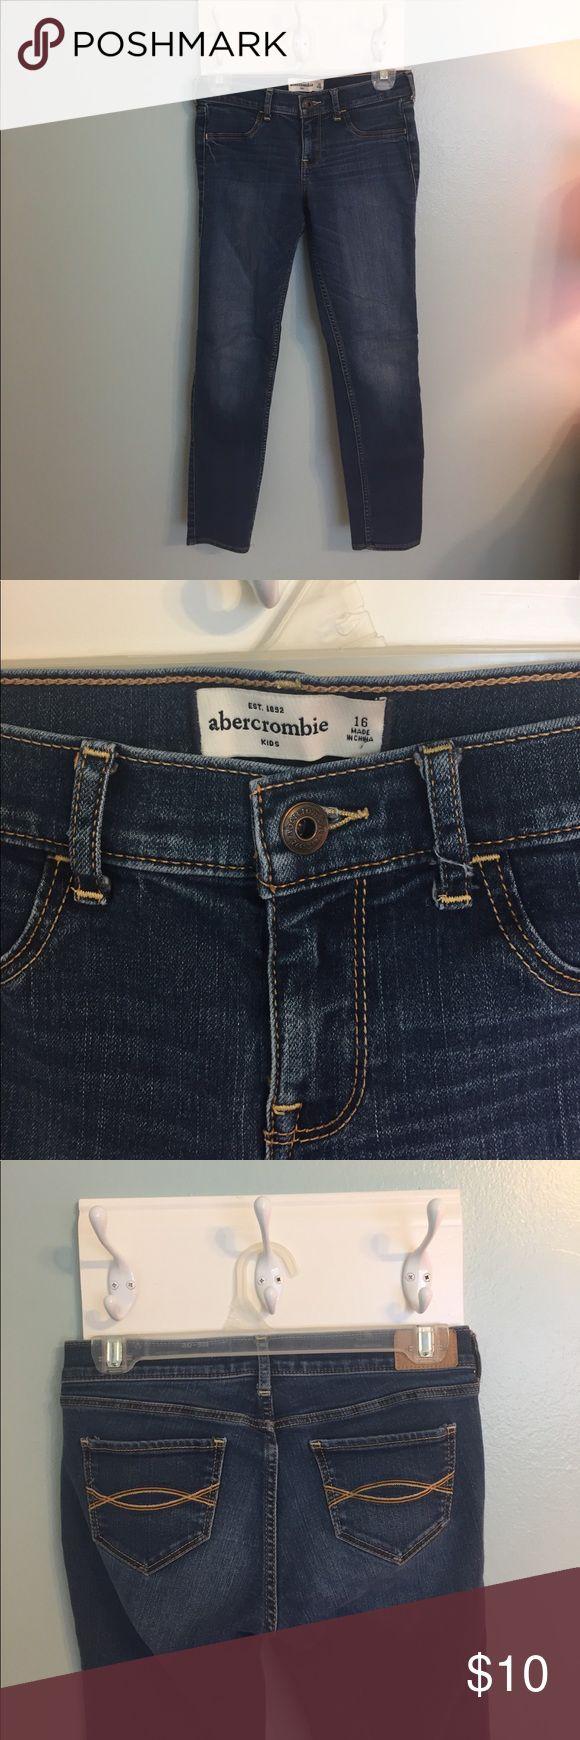 Abercrombie Kids girl jeans Size 16 girls blue jeans Jeans Skinny